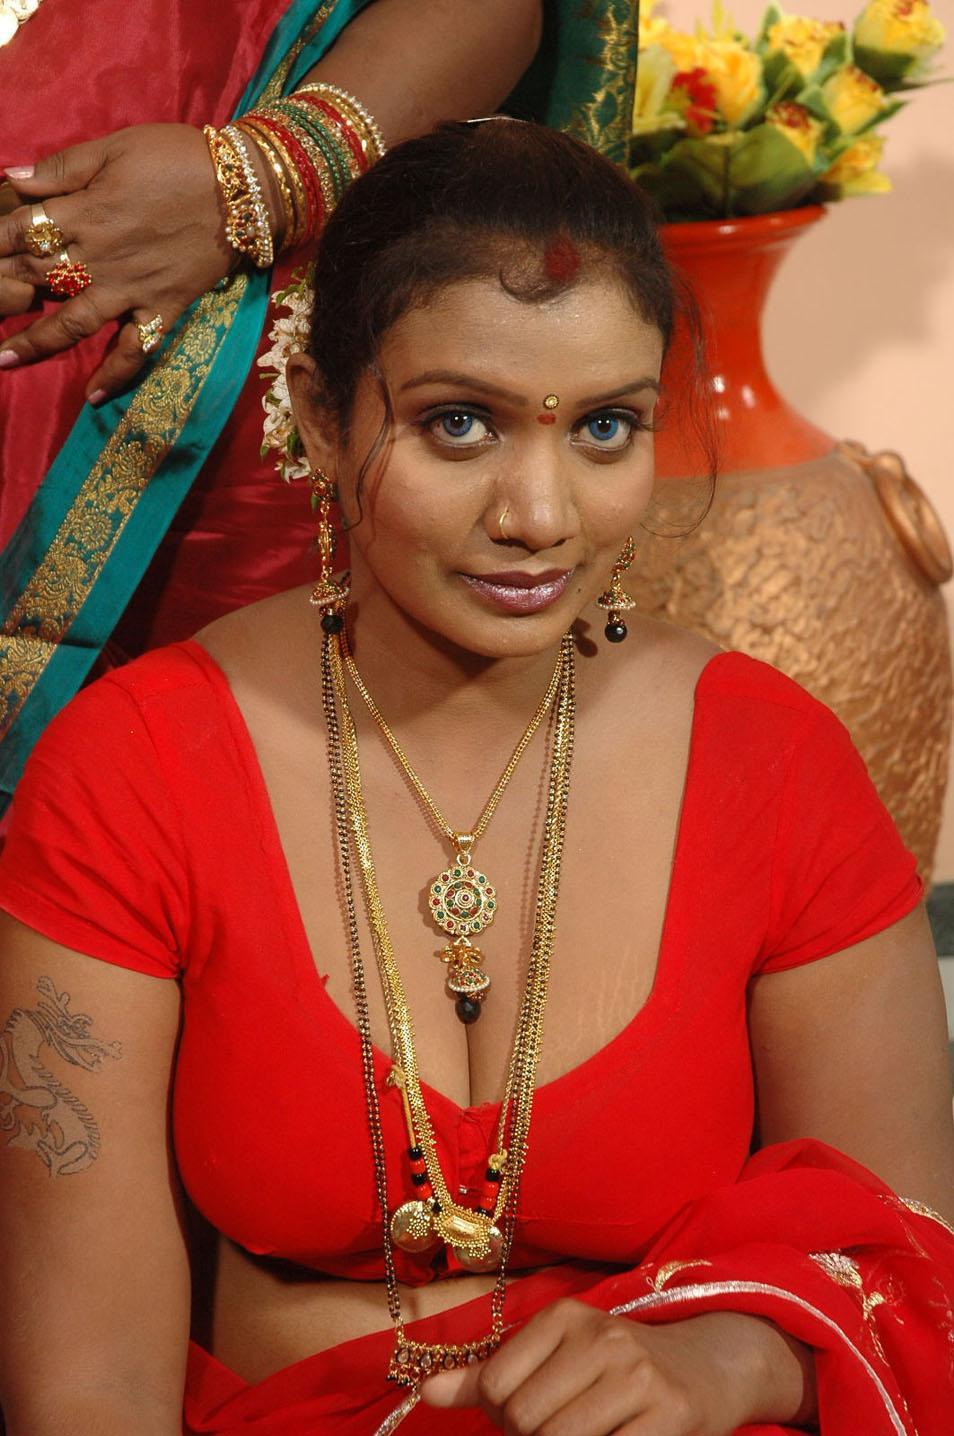 Hymen sex boobs in tamil aunty jurassic park porno